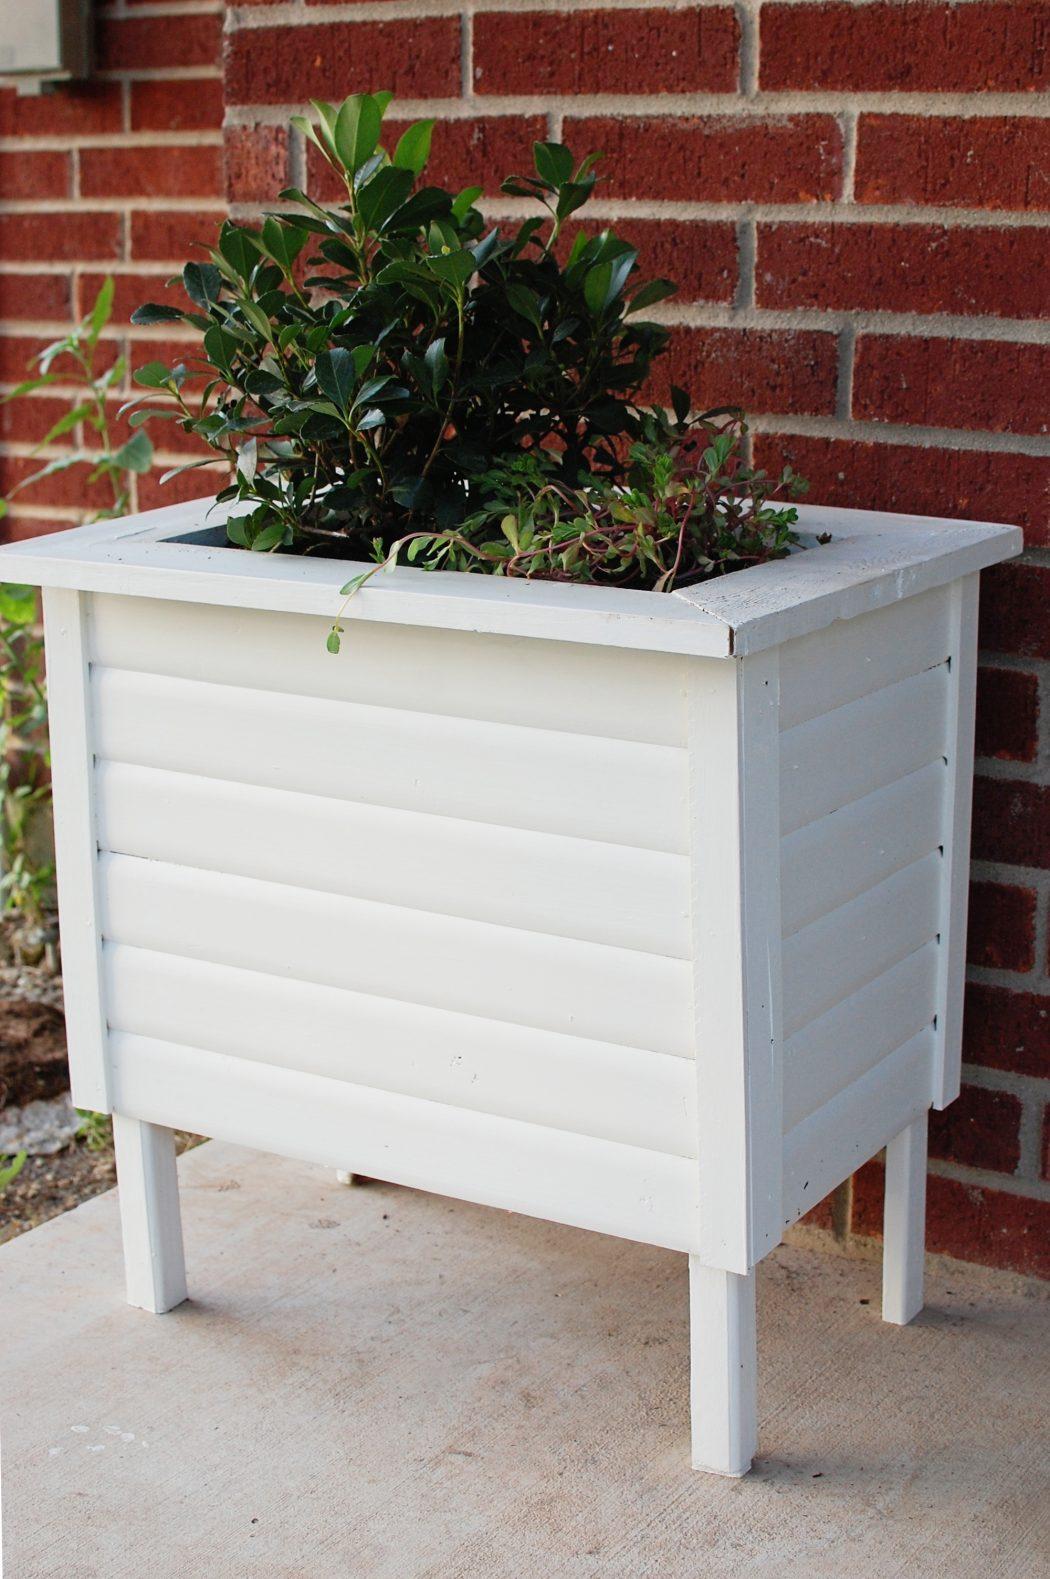 diyboxplanter4 10 Fascinating and Unique Ideas for Portable Gardens